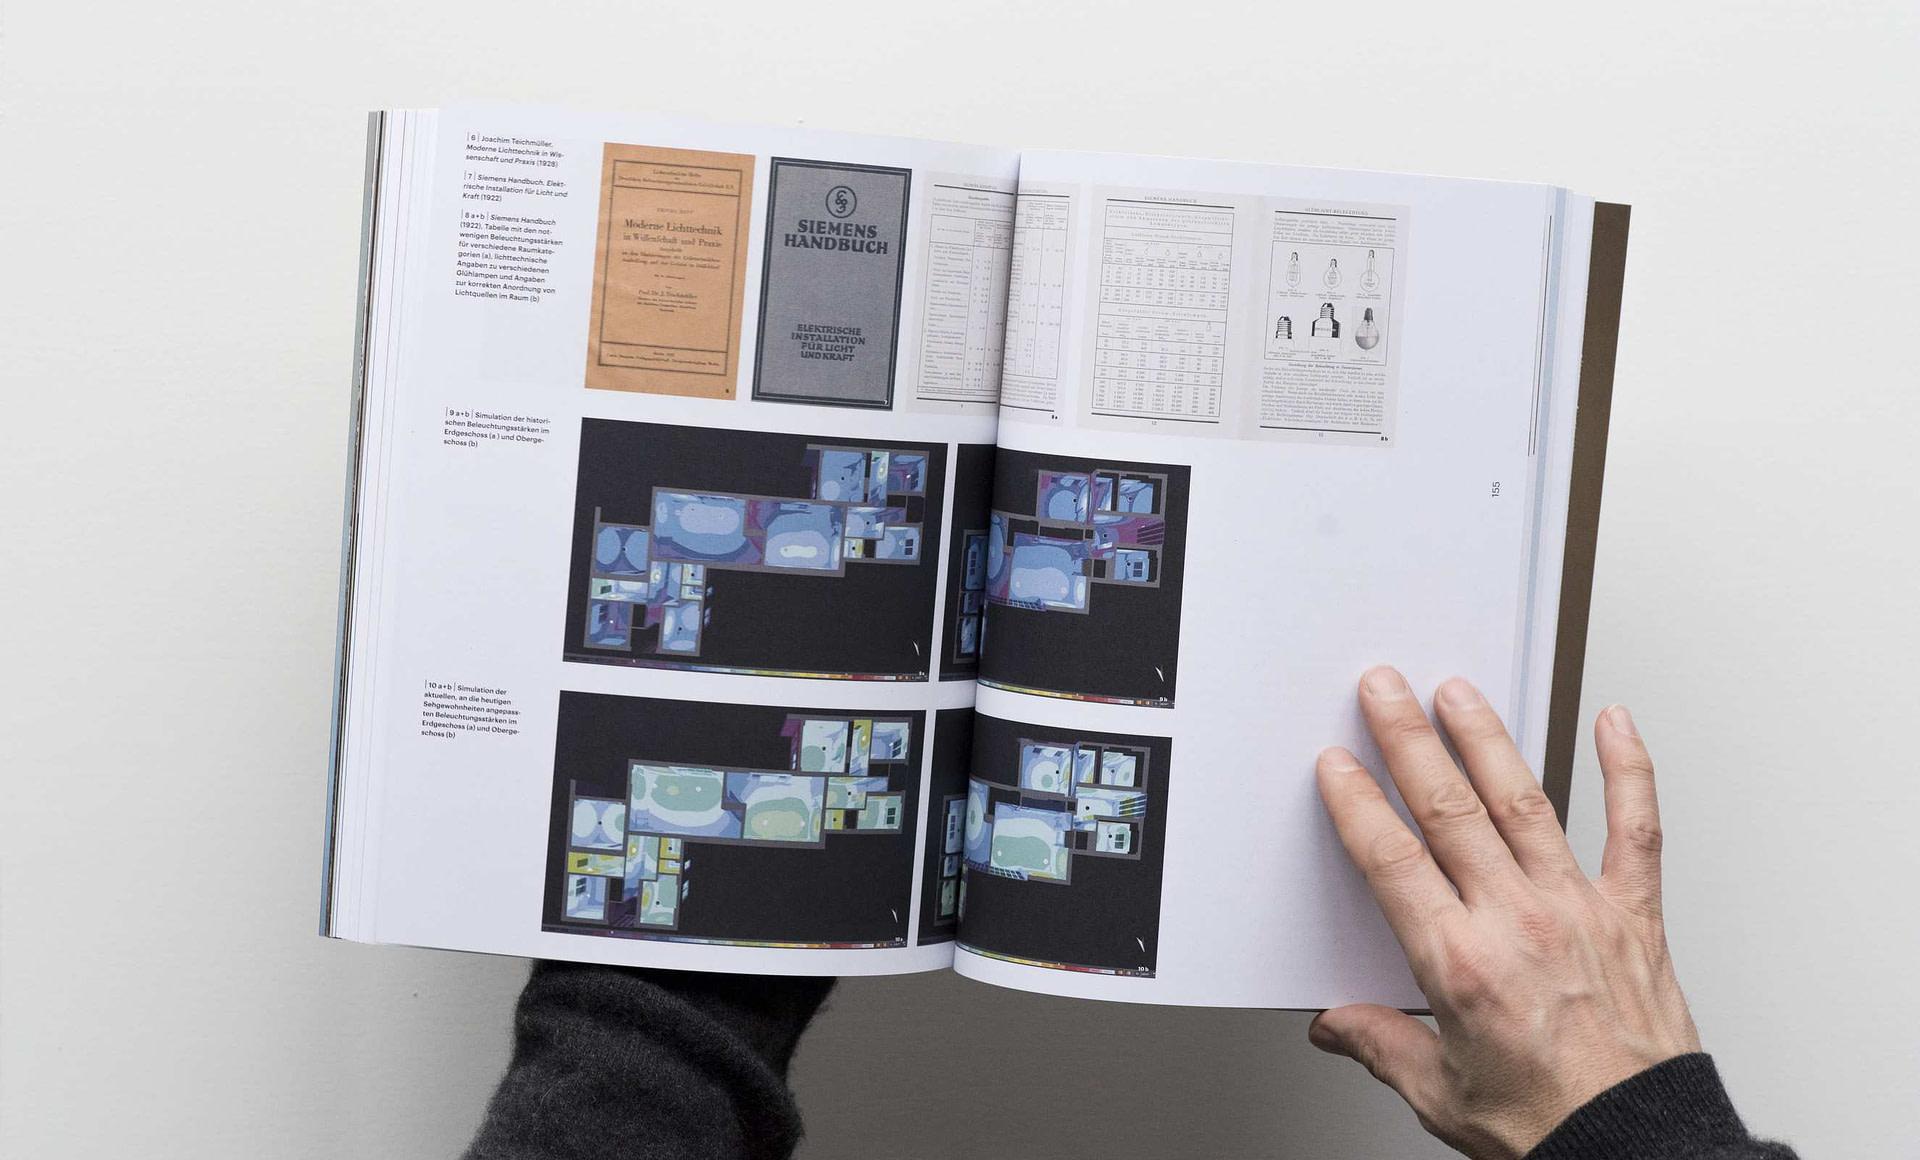 meisterhaus-kandinsky-klee-book-15-2650x1600px